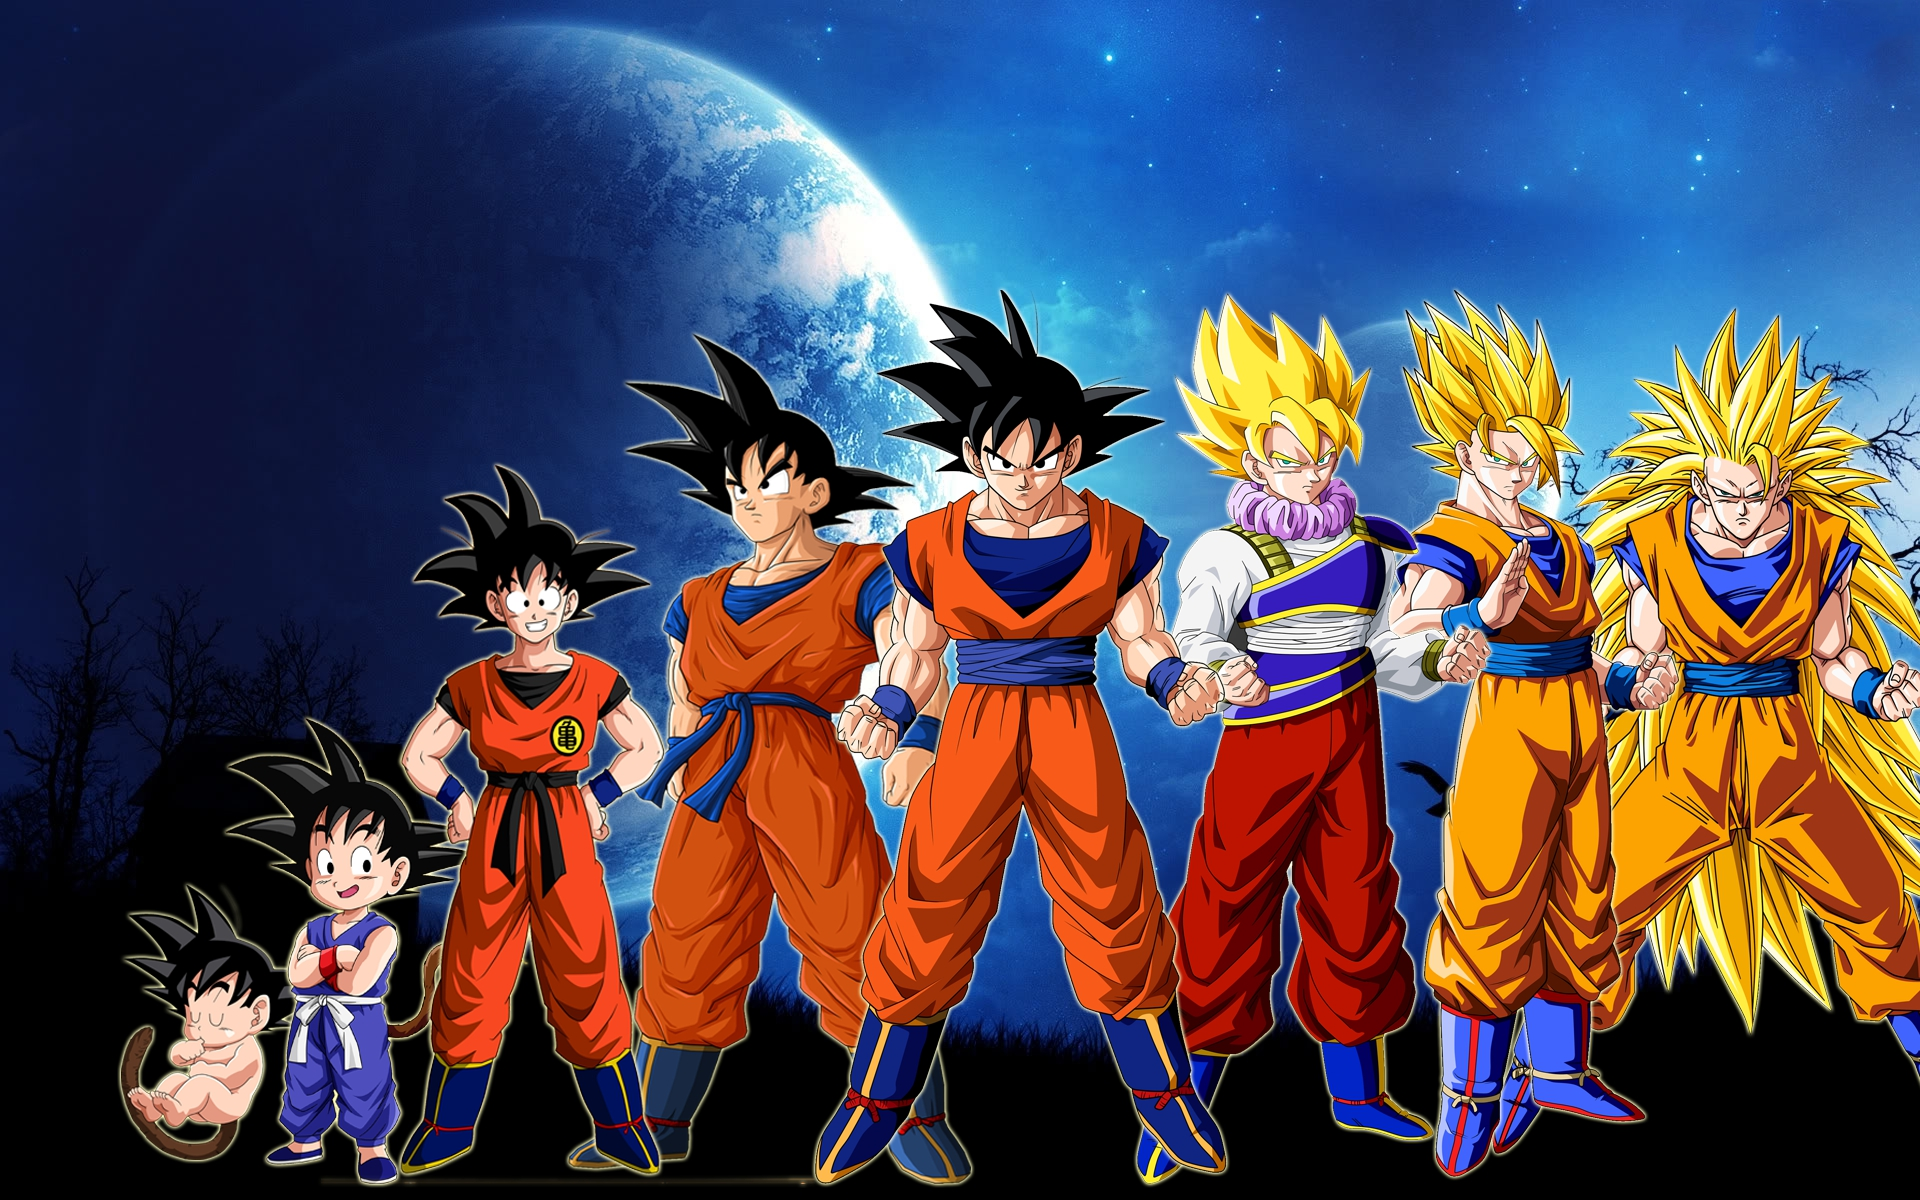 Goku Evolution Anime Hd Wallpaper 1920x1200 Full HD Wallpapers 1920x1200